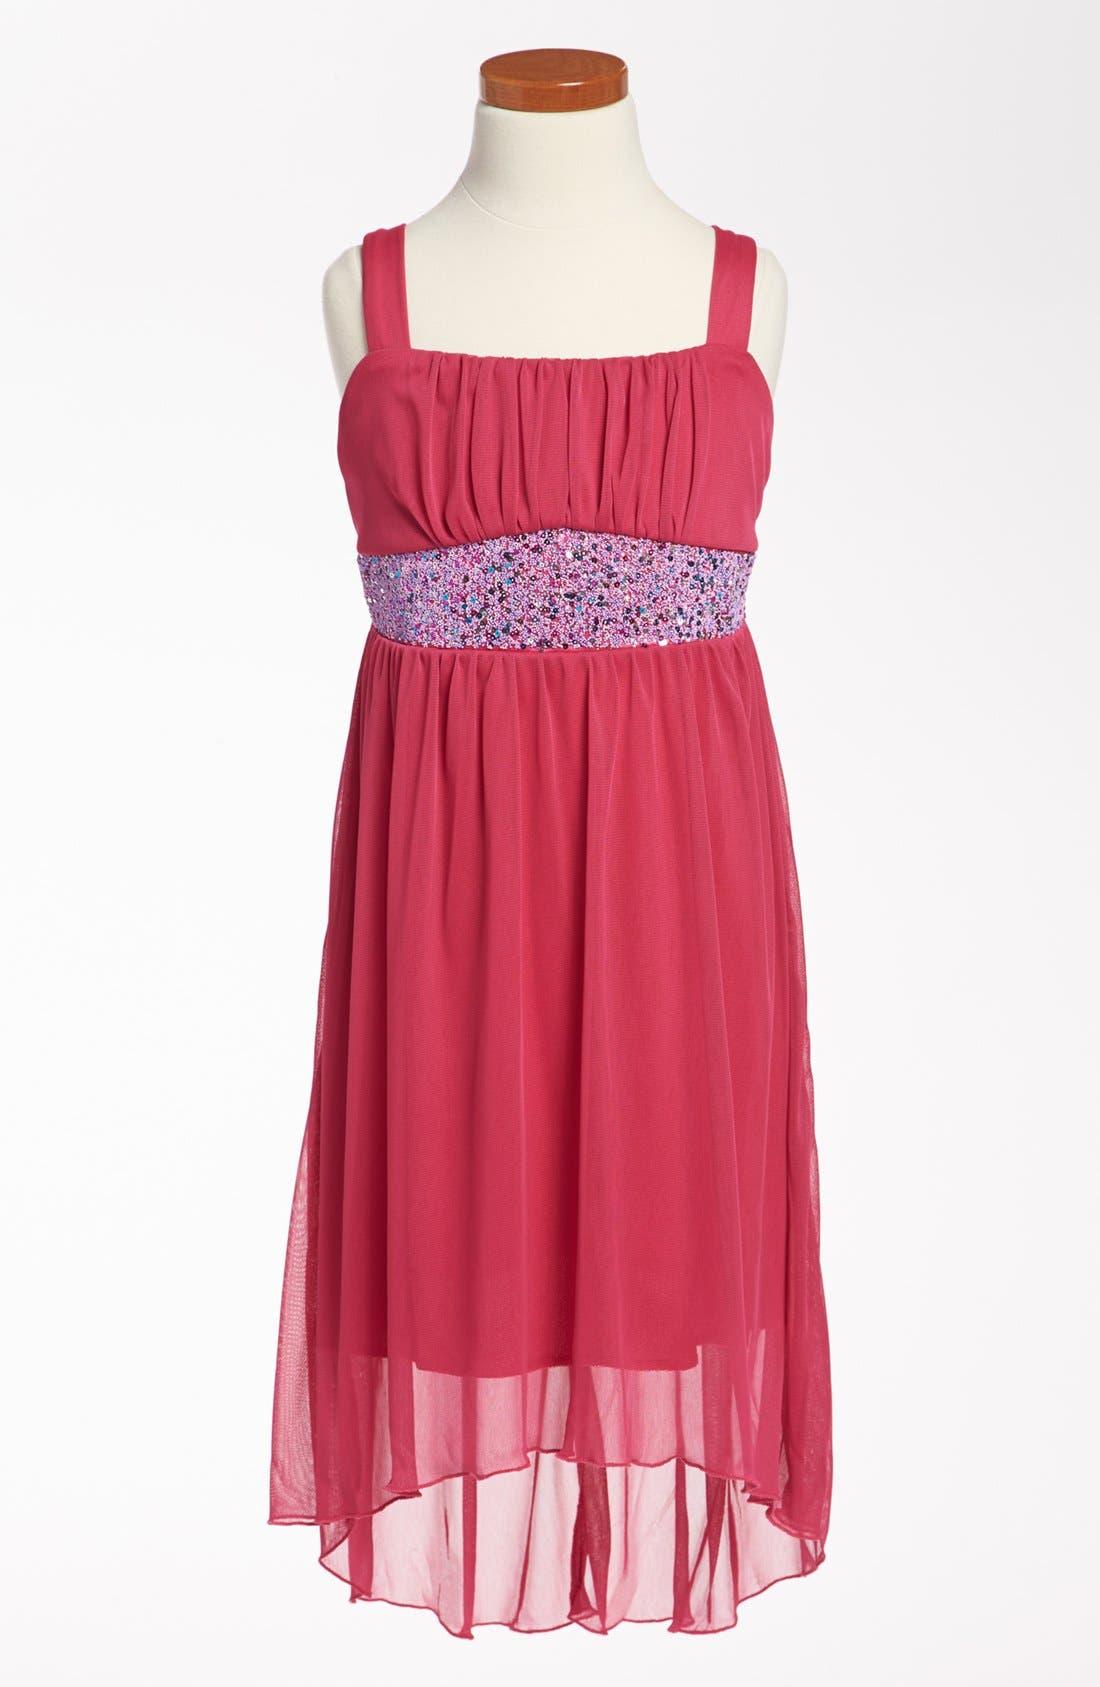 Alternate Image 1 Selected - Roxette Sleeveless Dress (Big Girls)